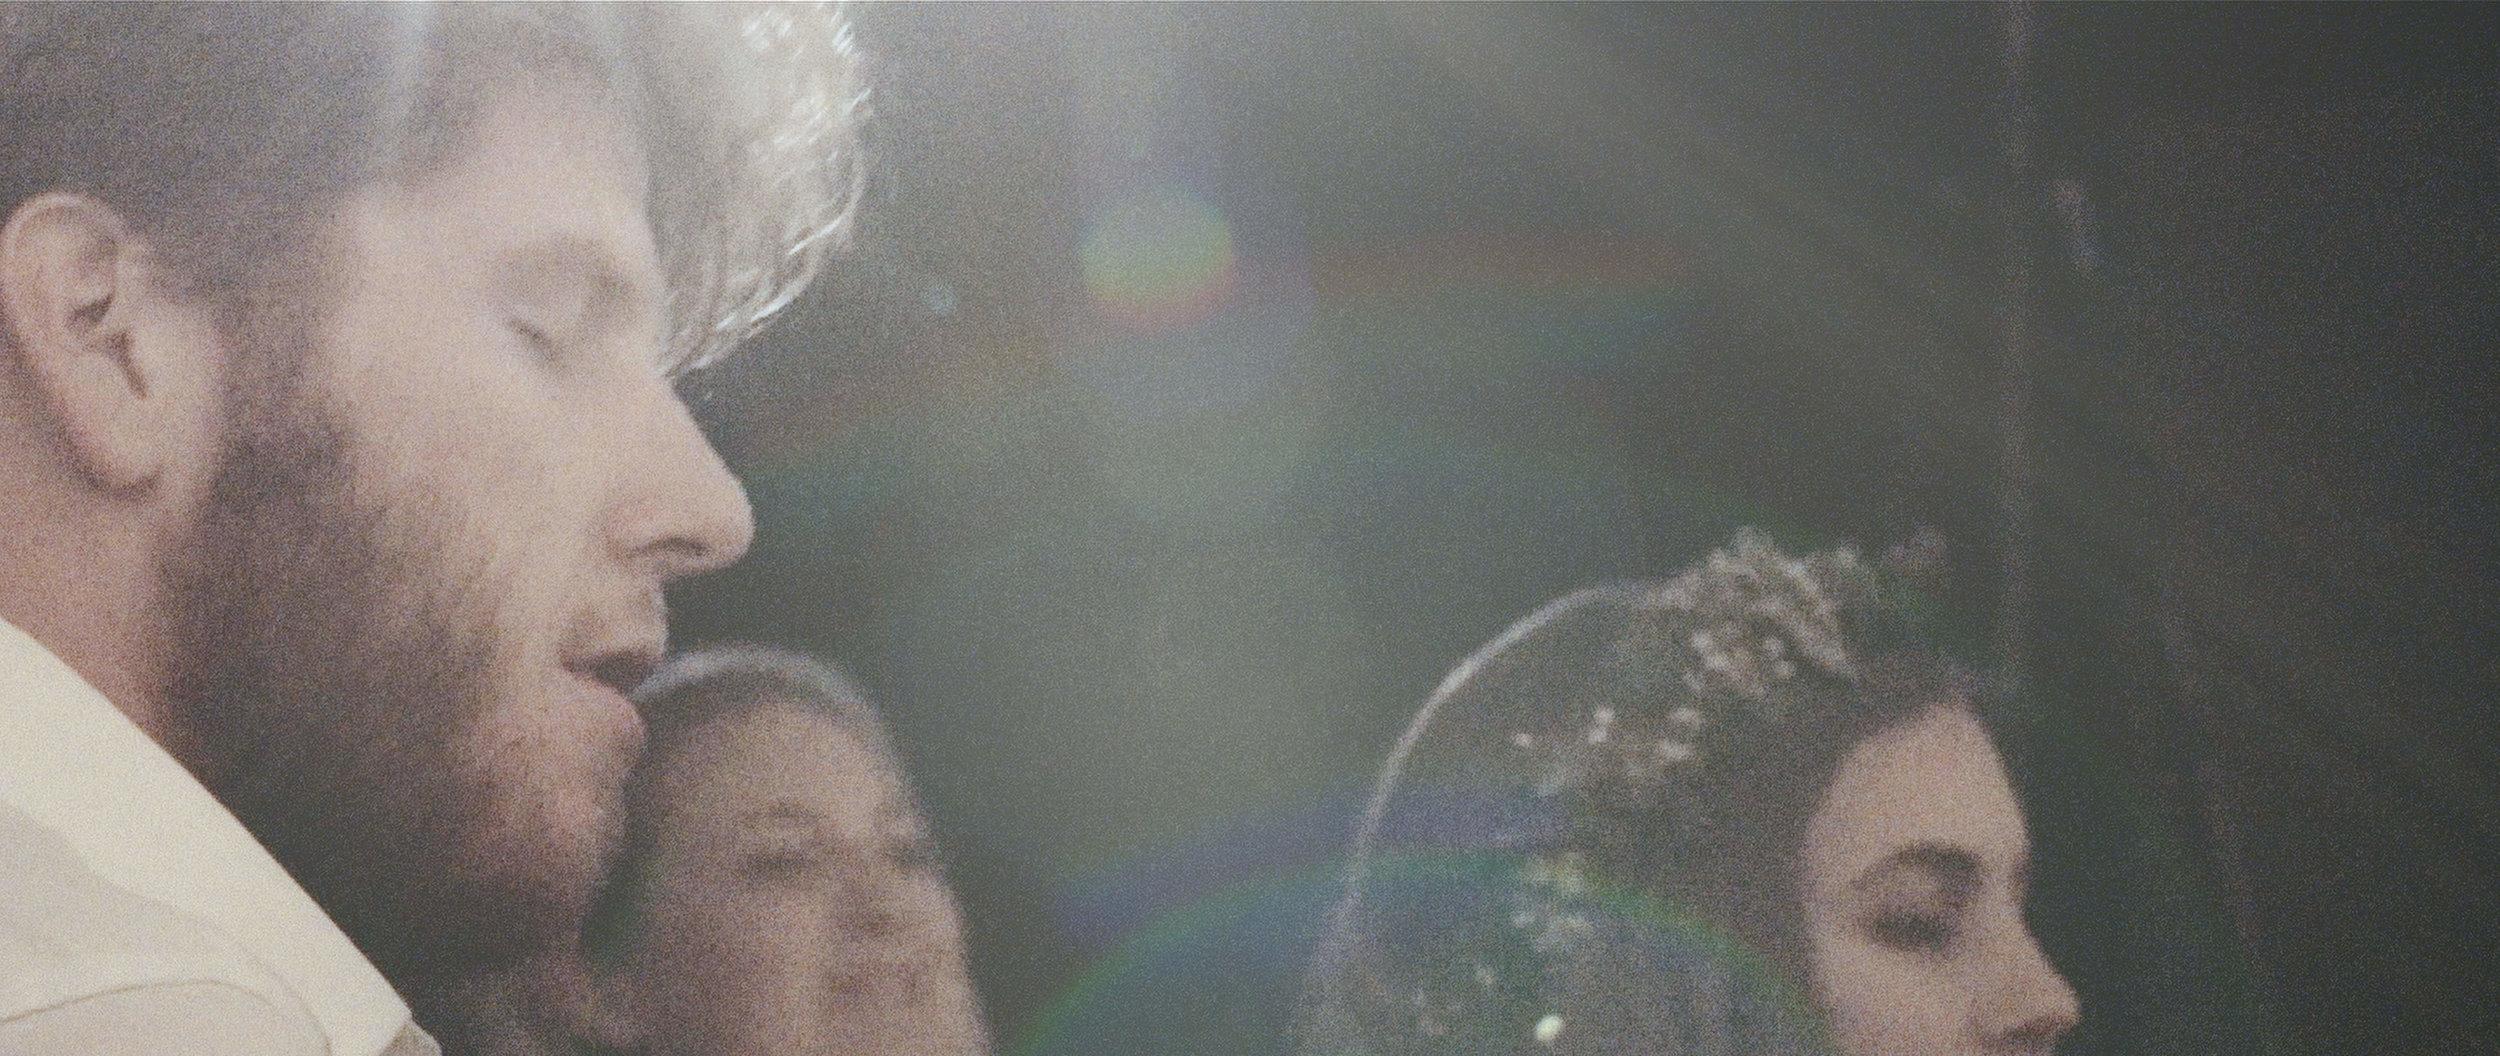 vancouver-wedding-videography192.jpg